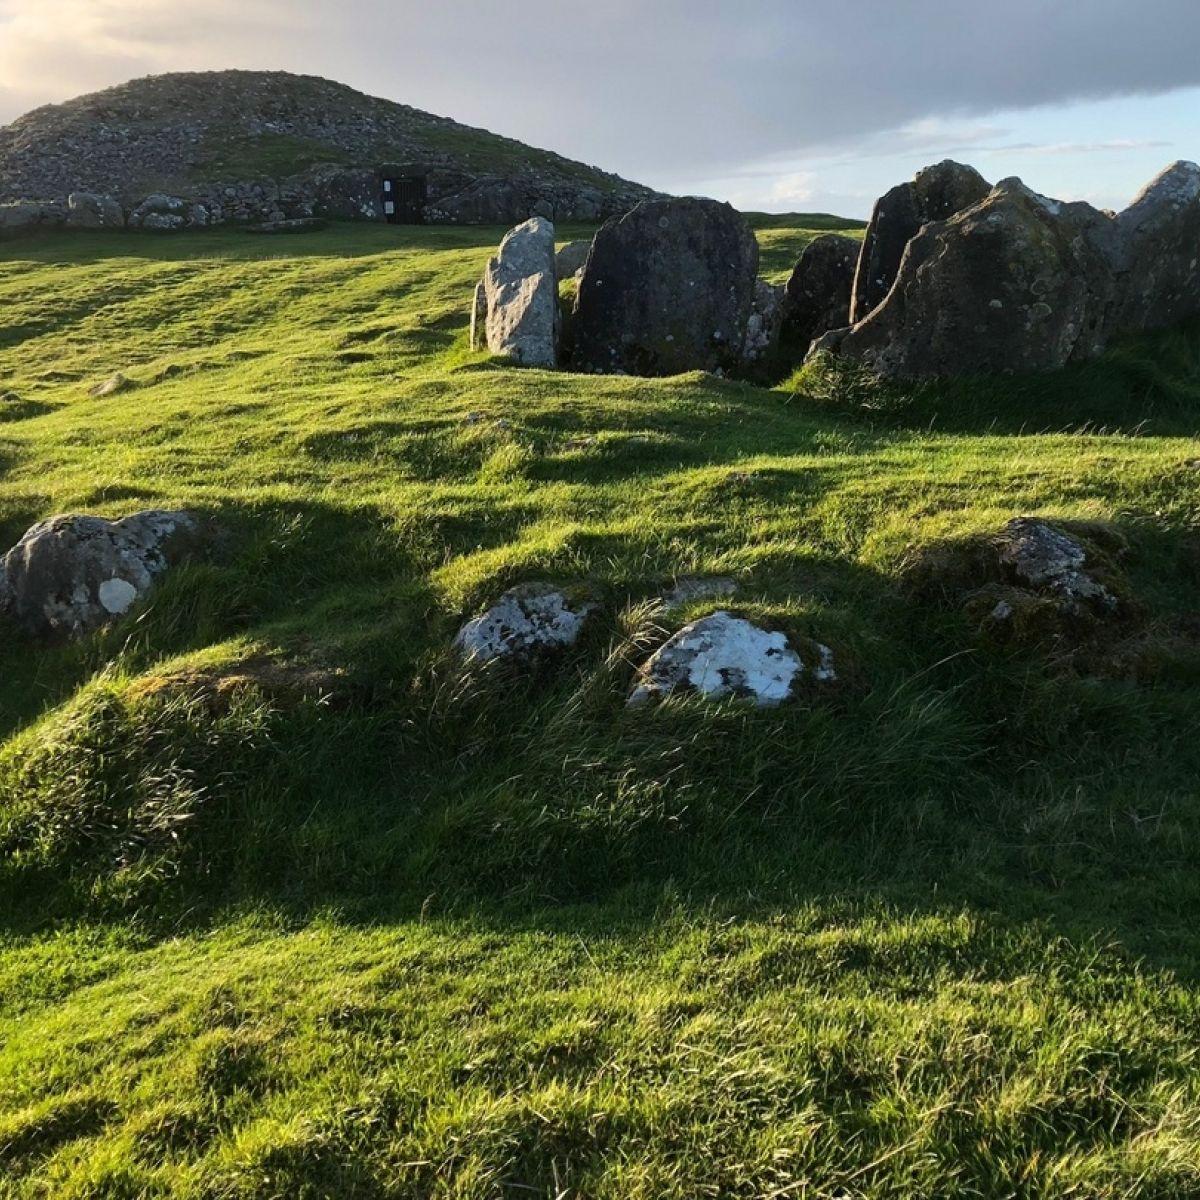 The 10 best hotels & places to stay in Navan, Ireland - Navan